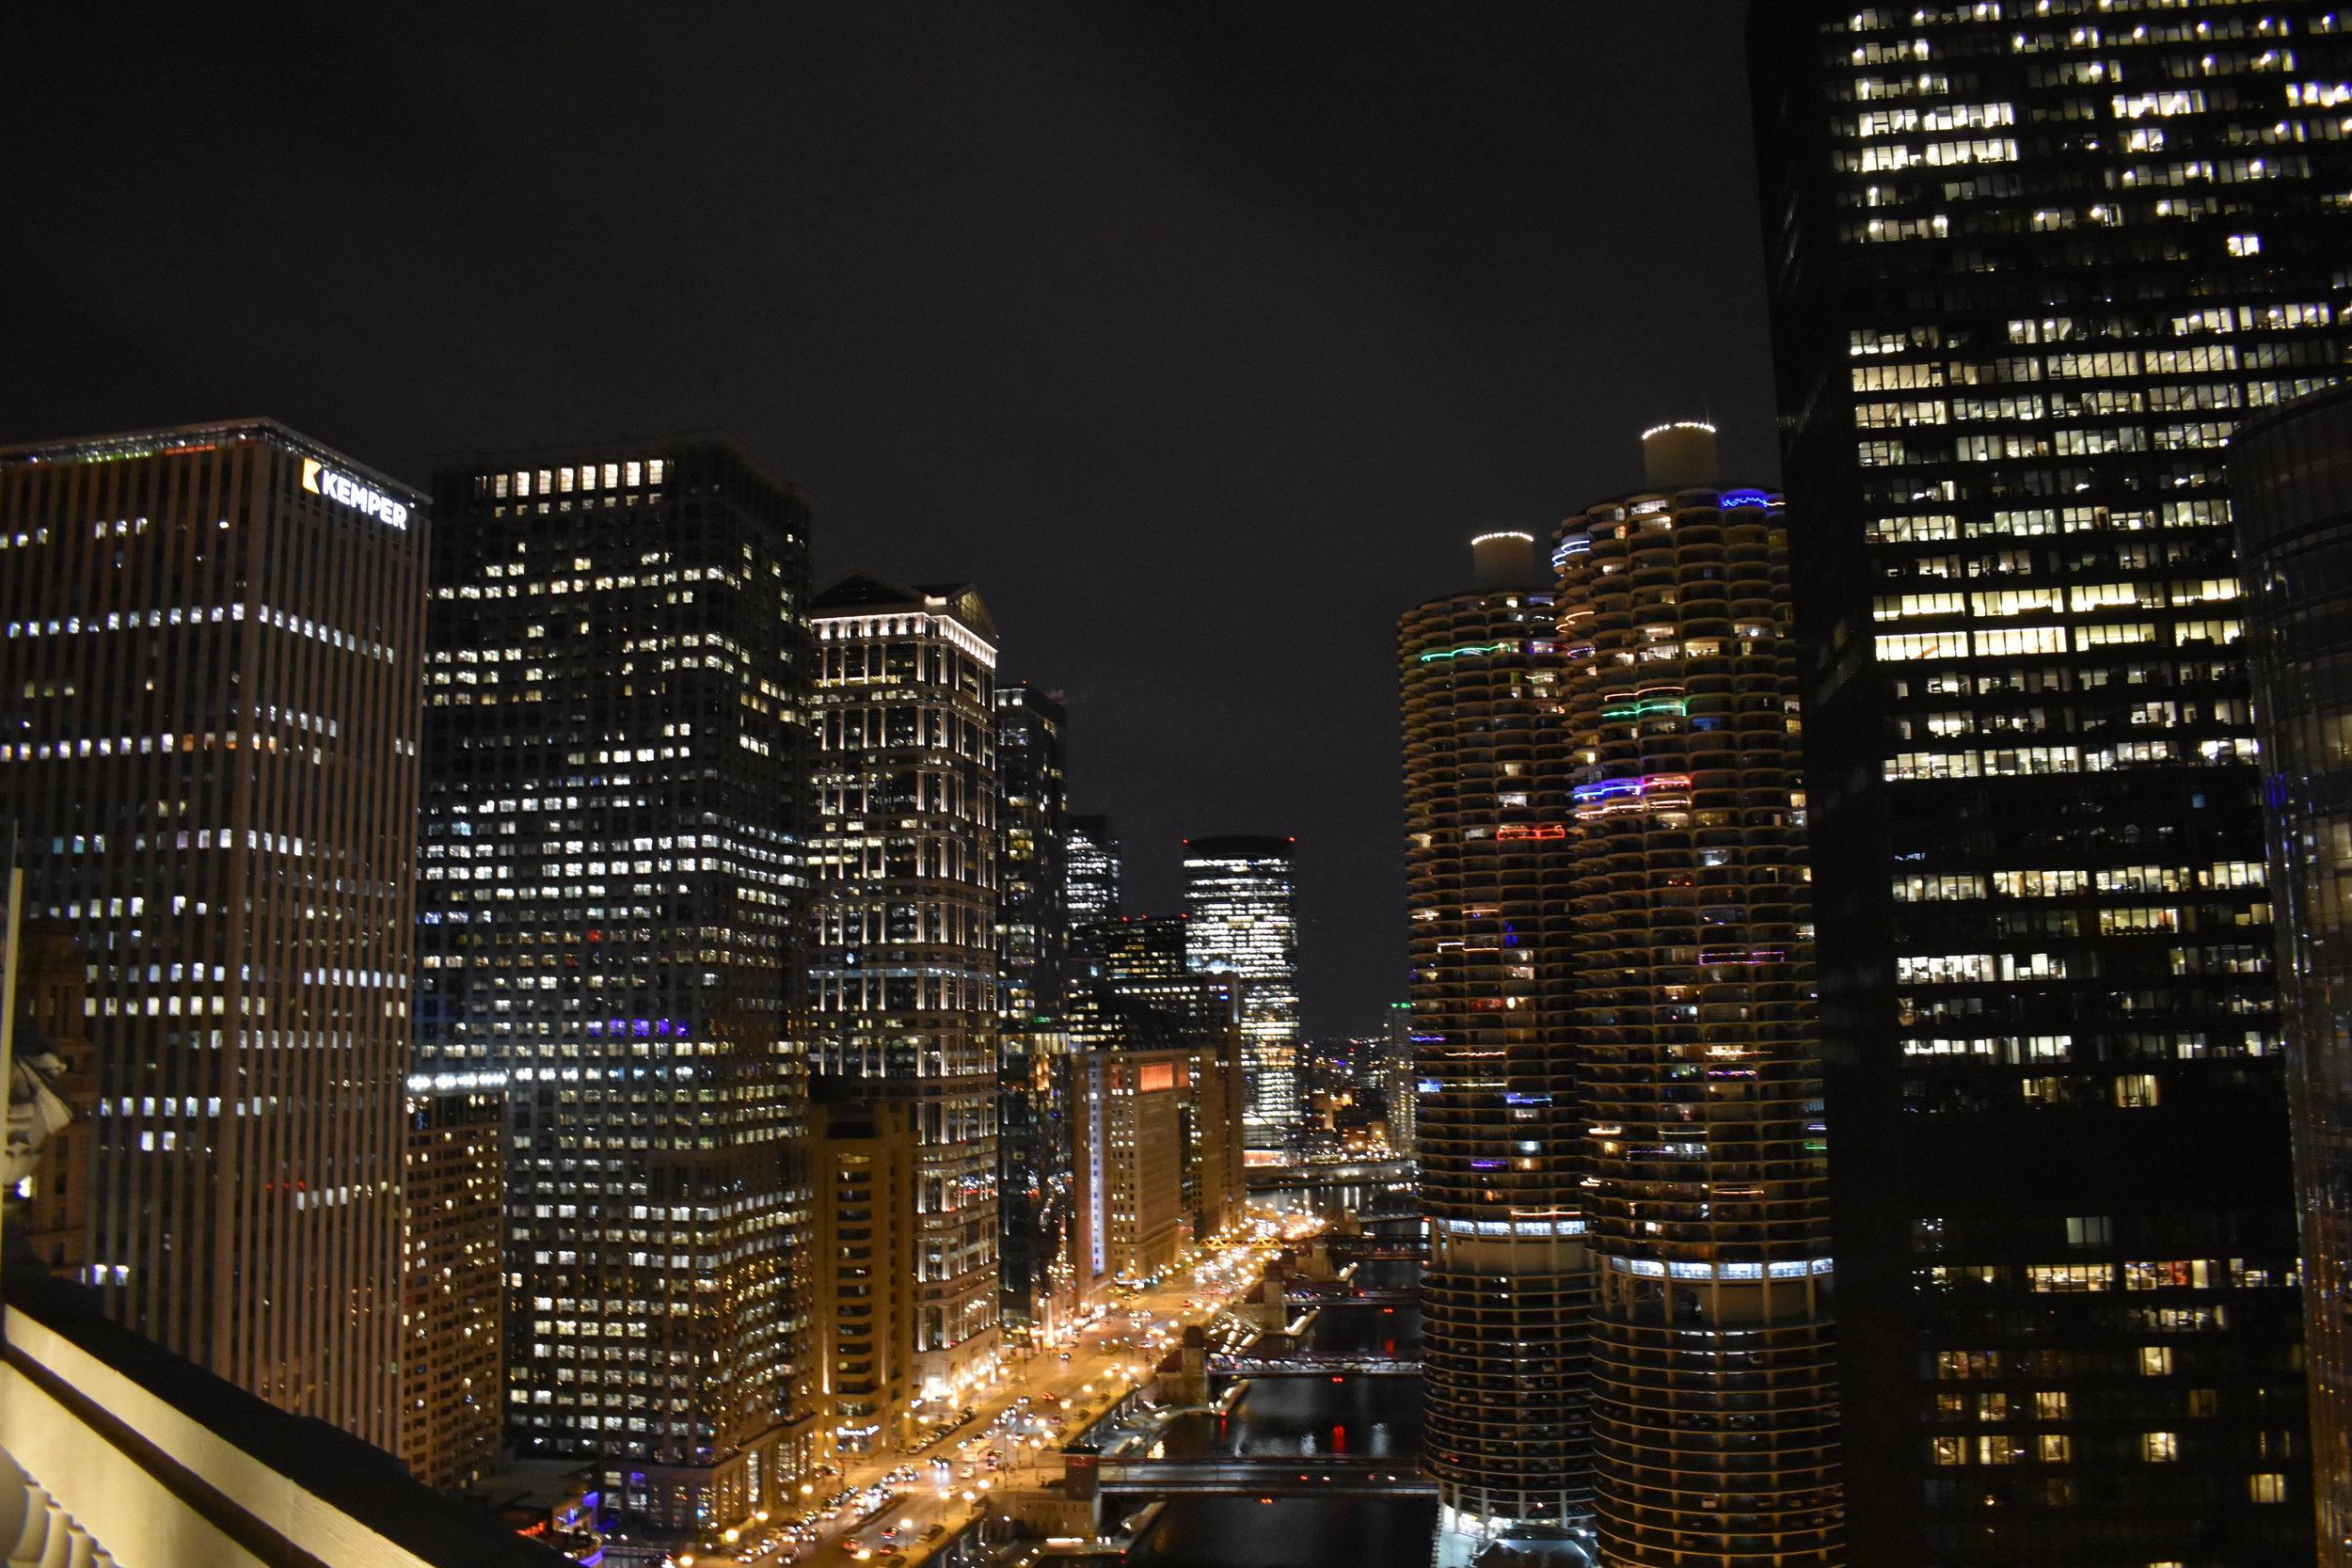 LondonHouse Rooftop, luzes da cidade e reflexo no Rio Chicago : ENCANTO!